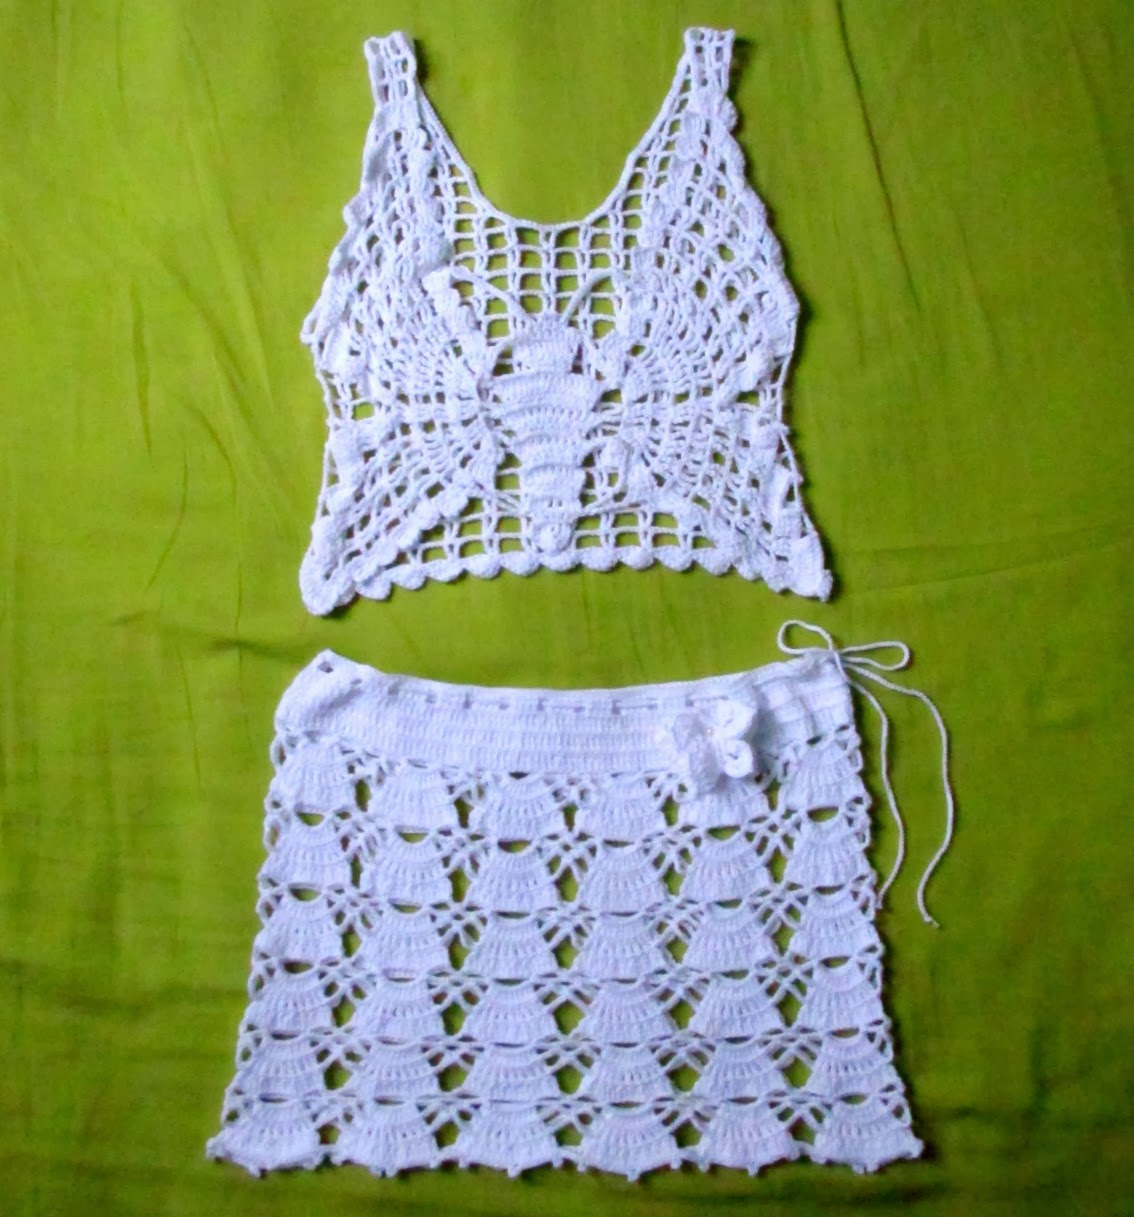 57f40733a811e Raquelita Rojas  Ropa Tejida Artesanalmente a Crochet - Lima Perú